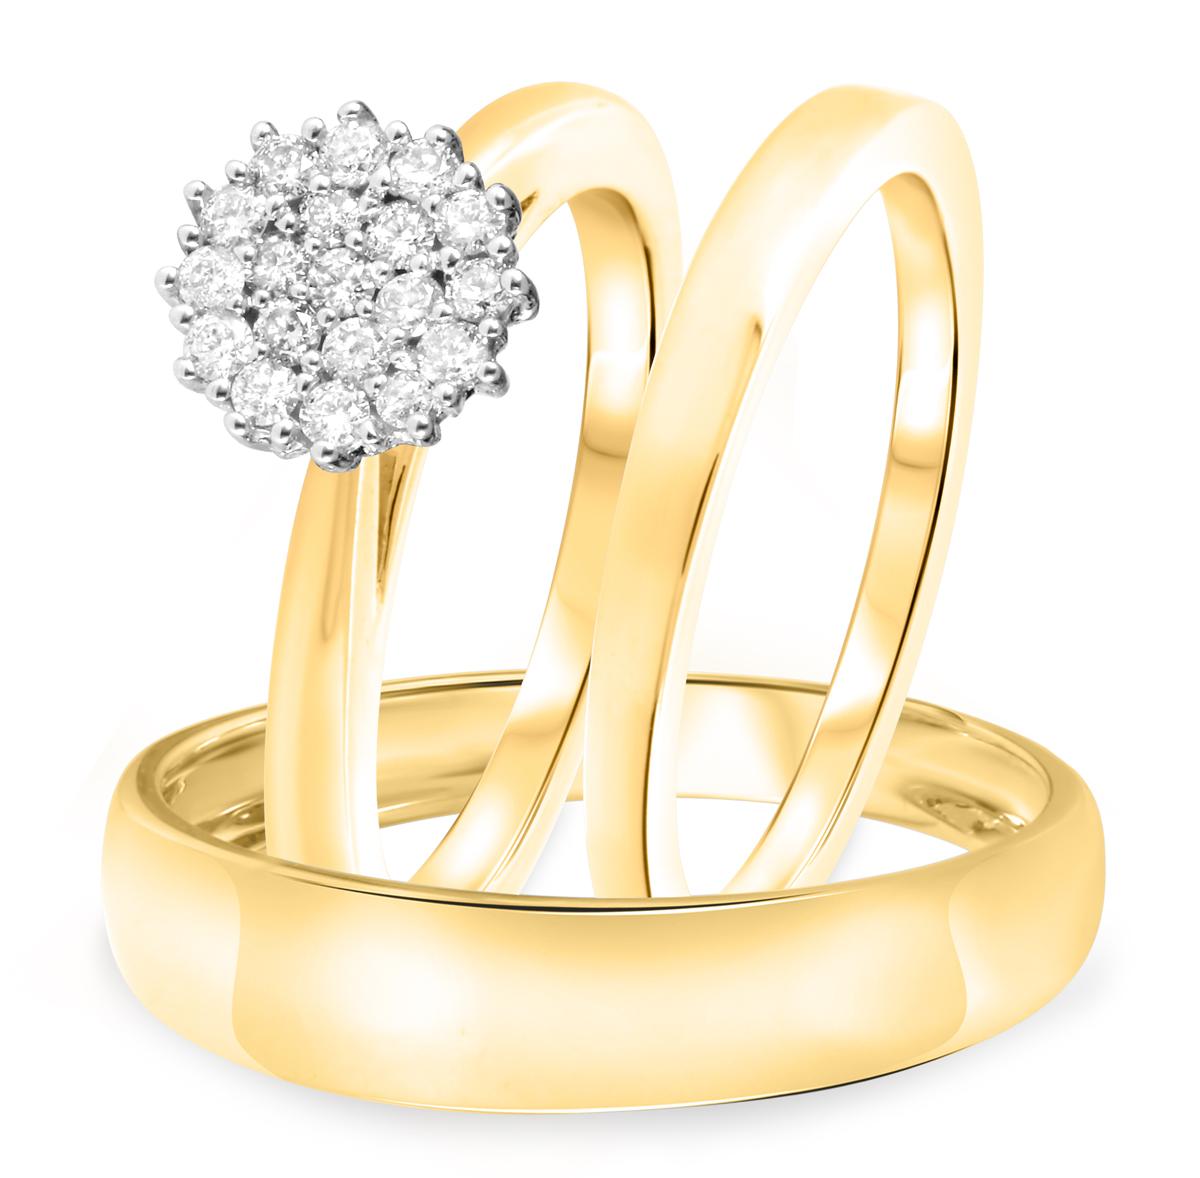 1/2 CT. T.W. Diamond Ladies Engagement Ring, Wedding Band, Men's Wedding Band